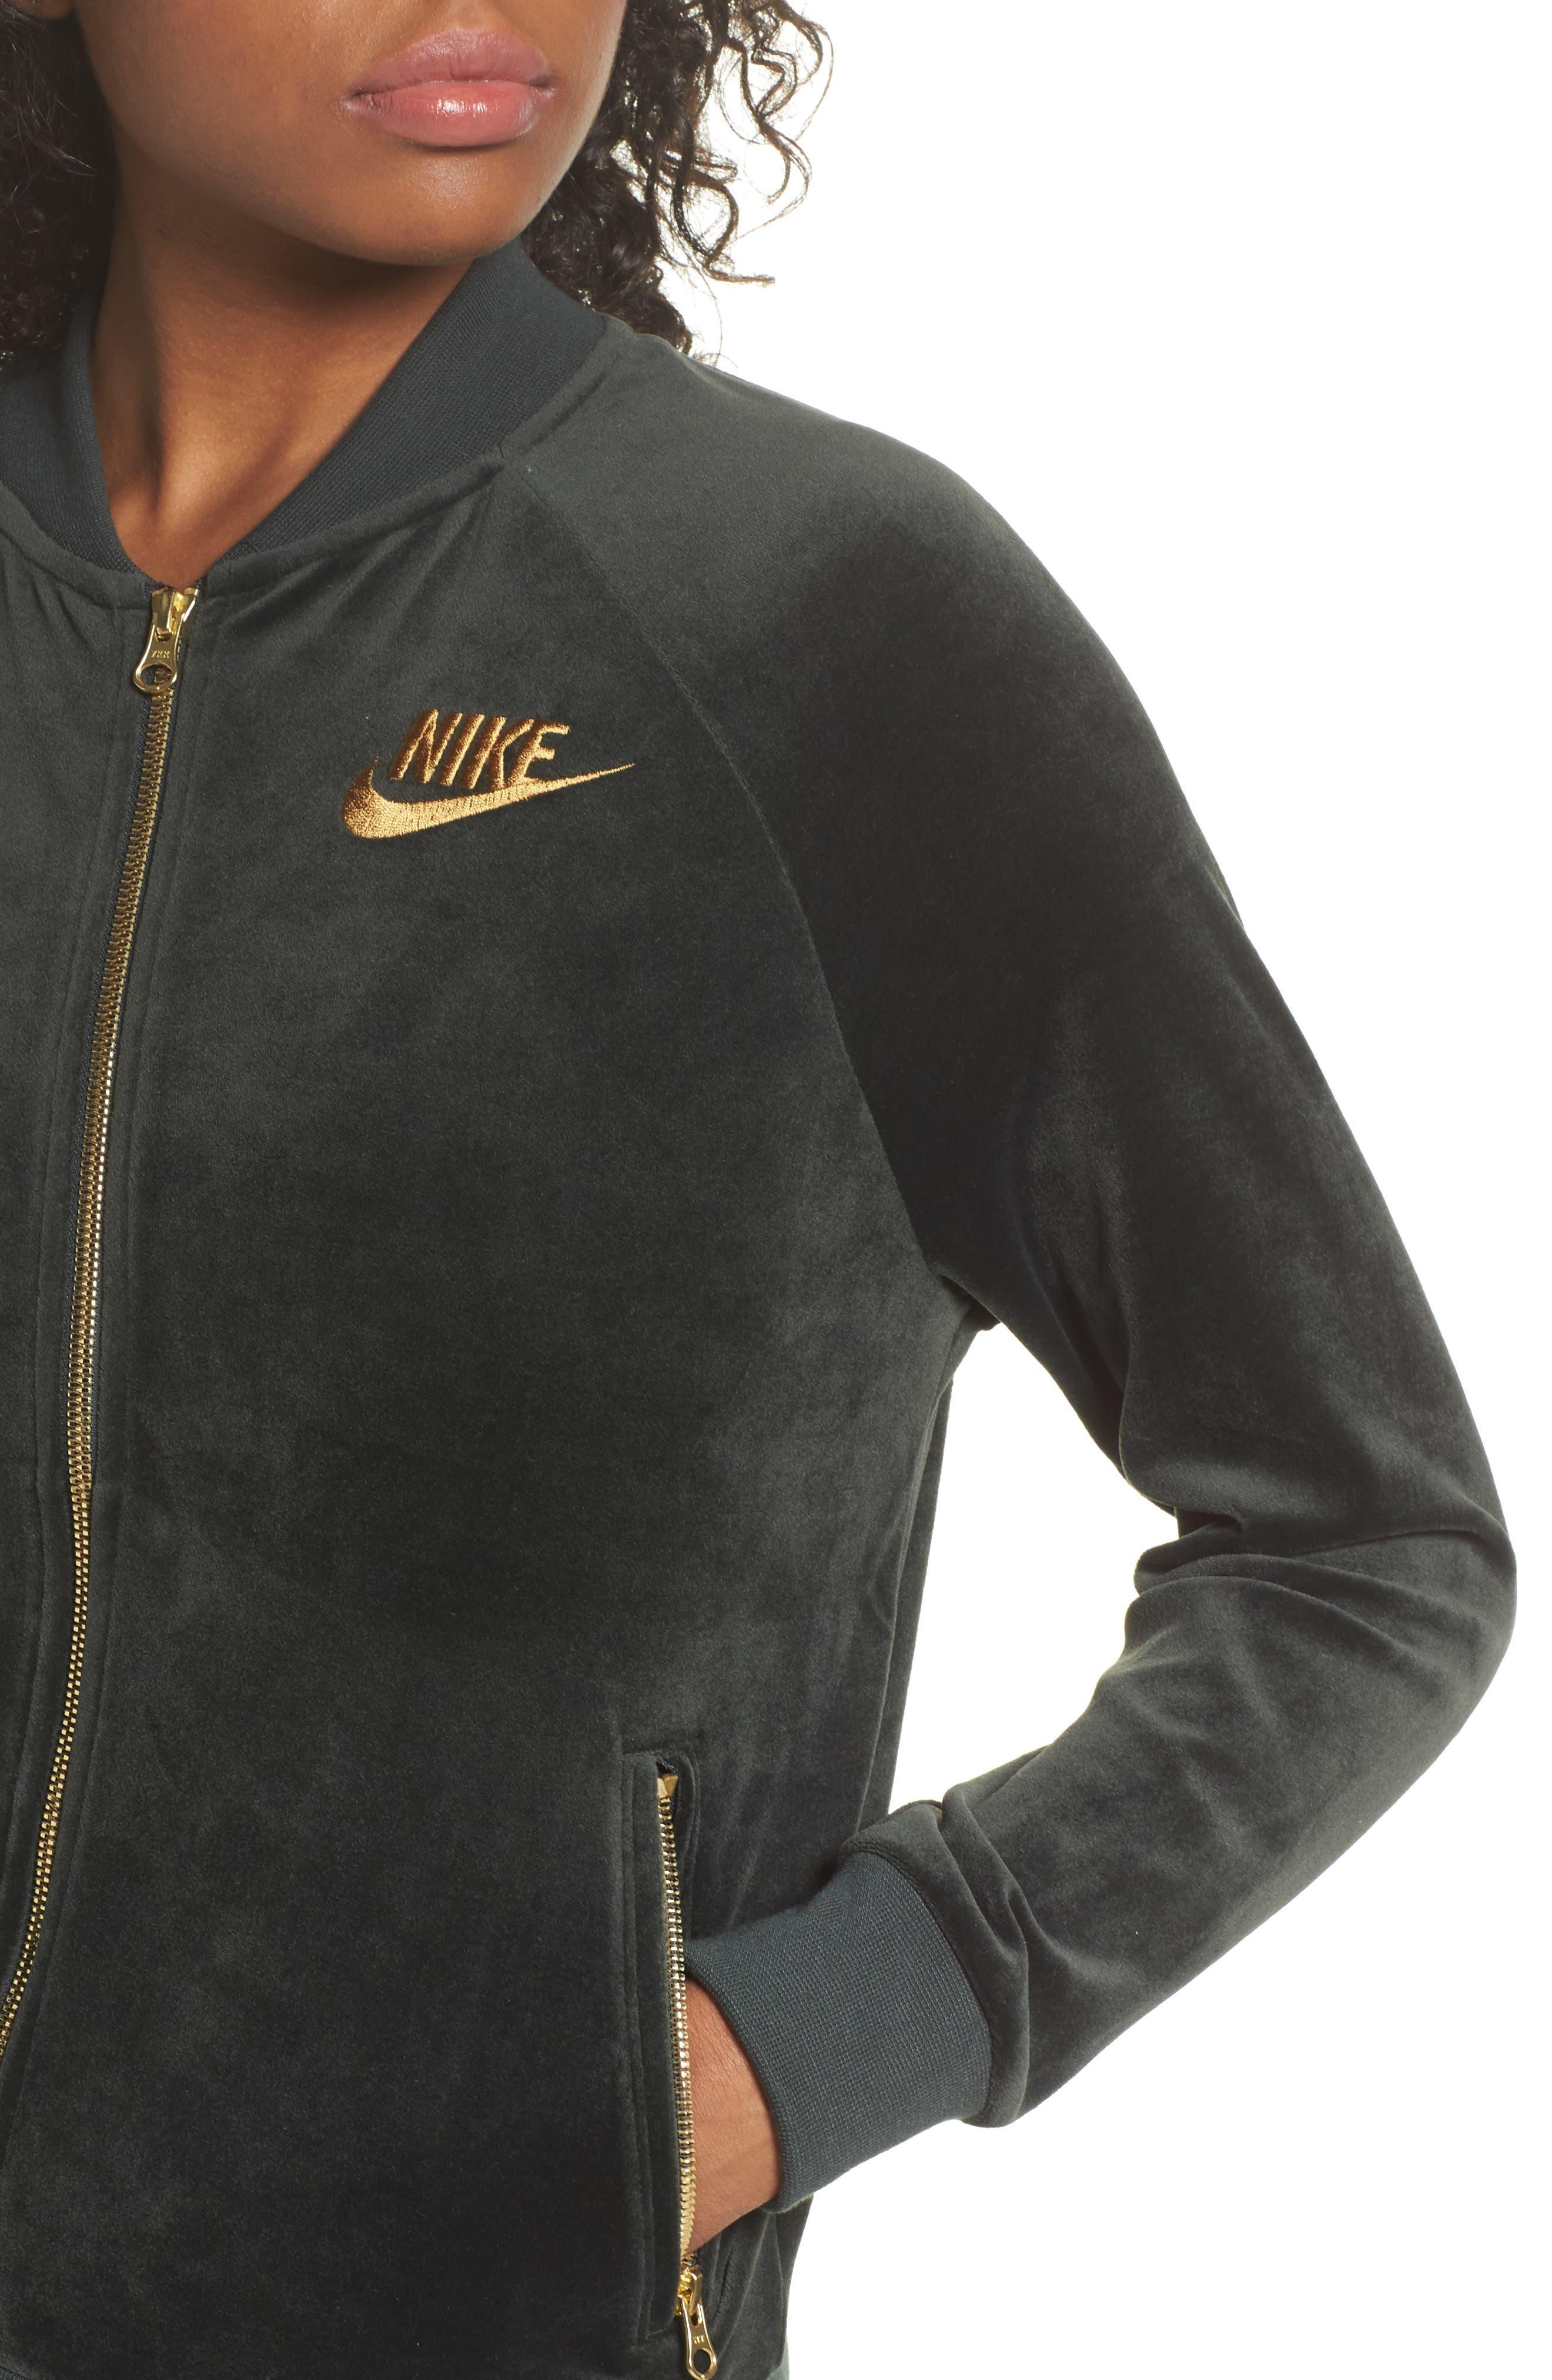 Velour Jacket,                             Alternate thumbnail 4, color,                             Outdoor Green/ Metallic Gold